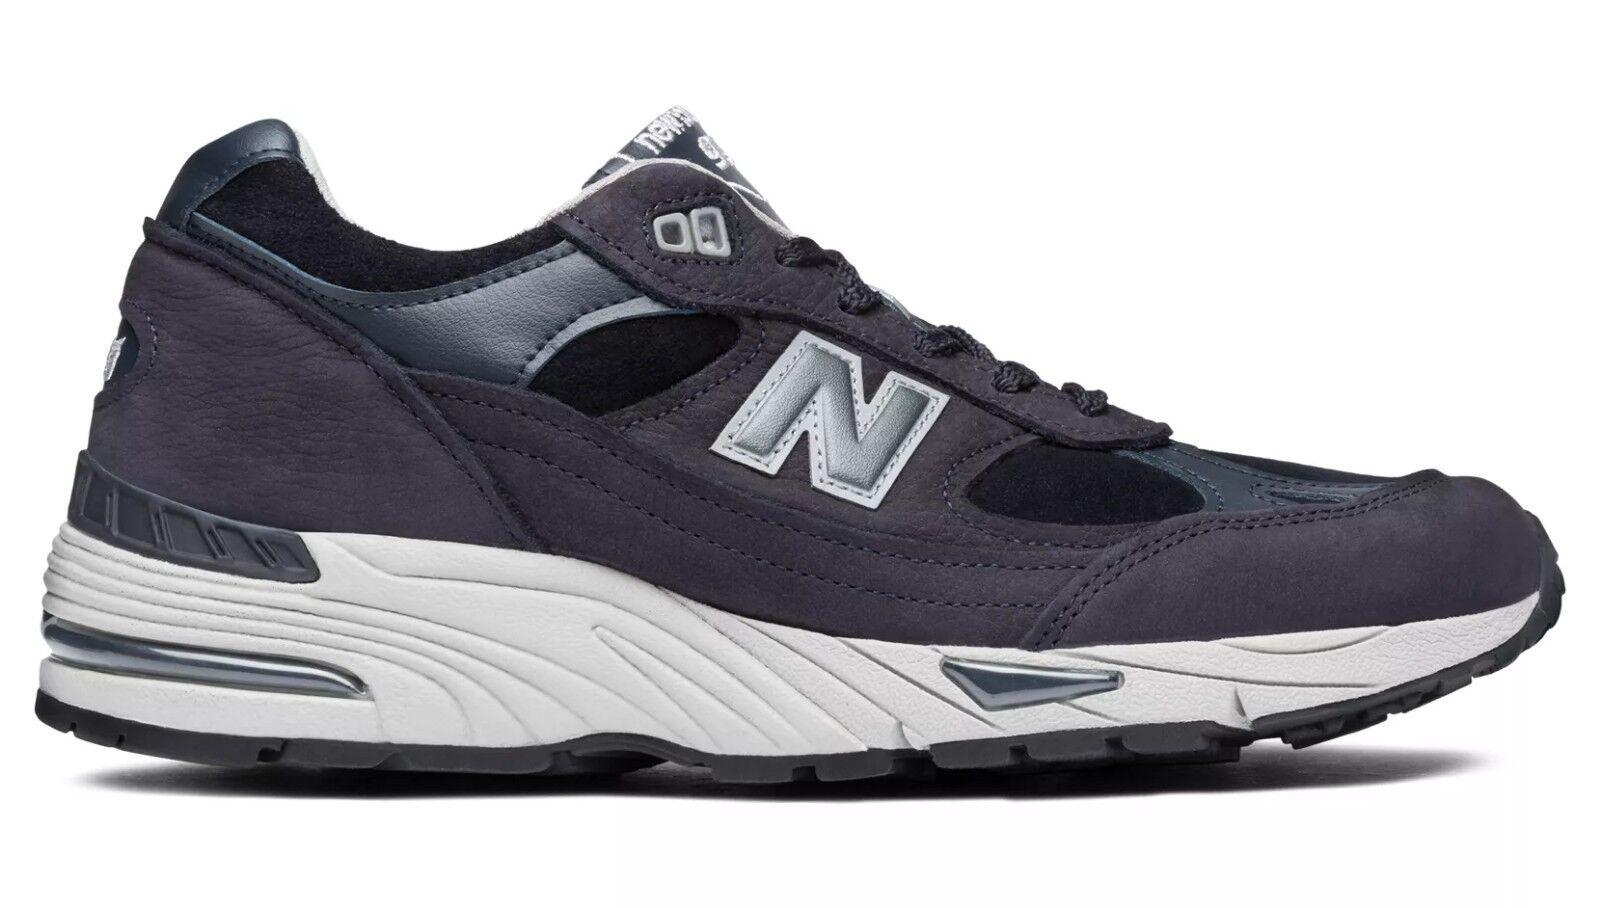 New balance uk 991 npn in uk balance scarpa lifestyle sneaker  Herren pelle Blau marine 9917a2